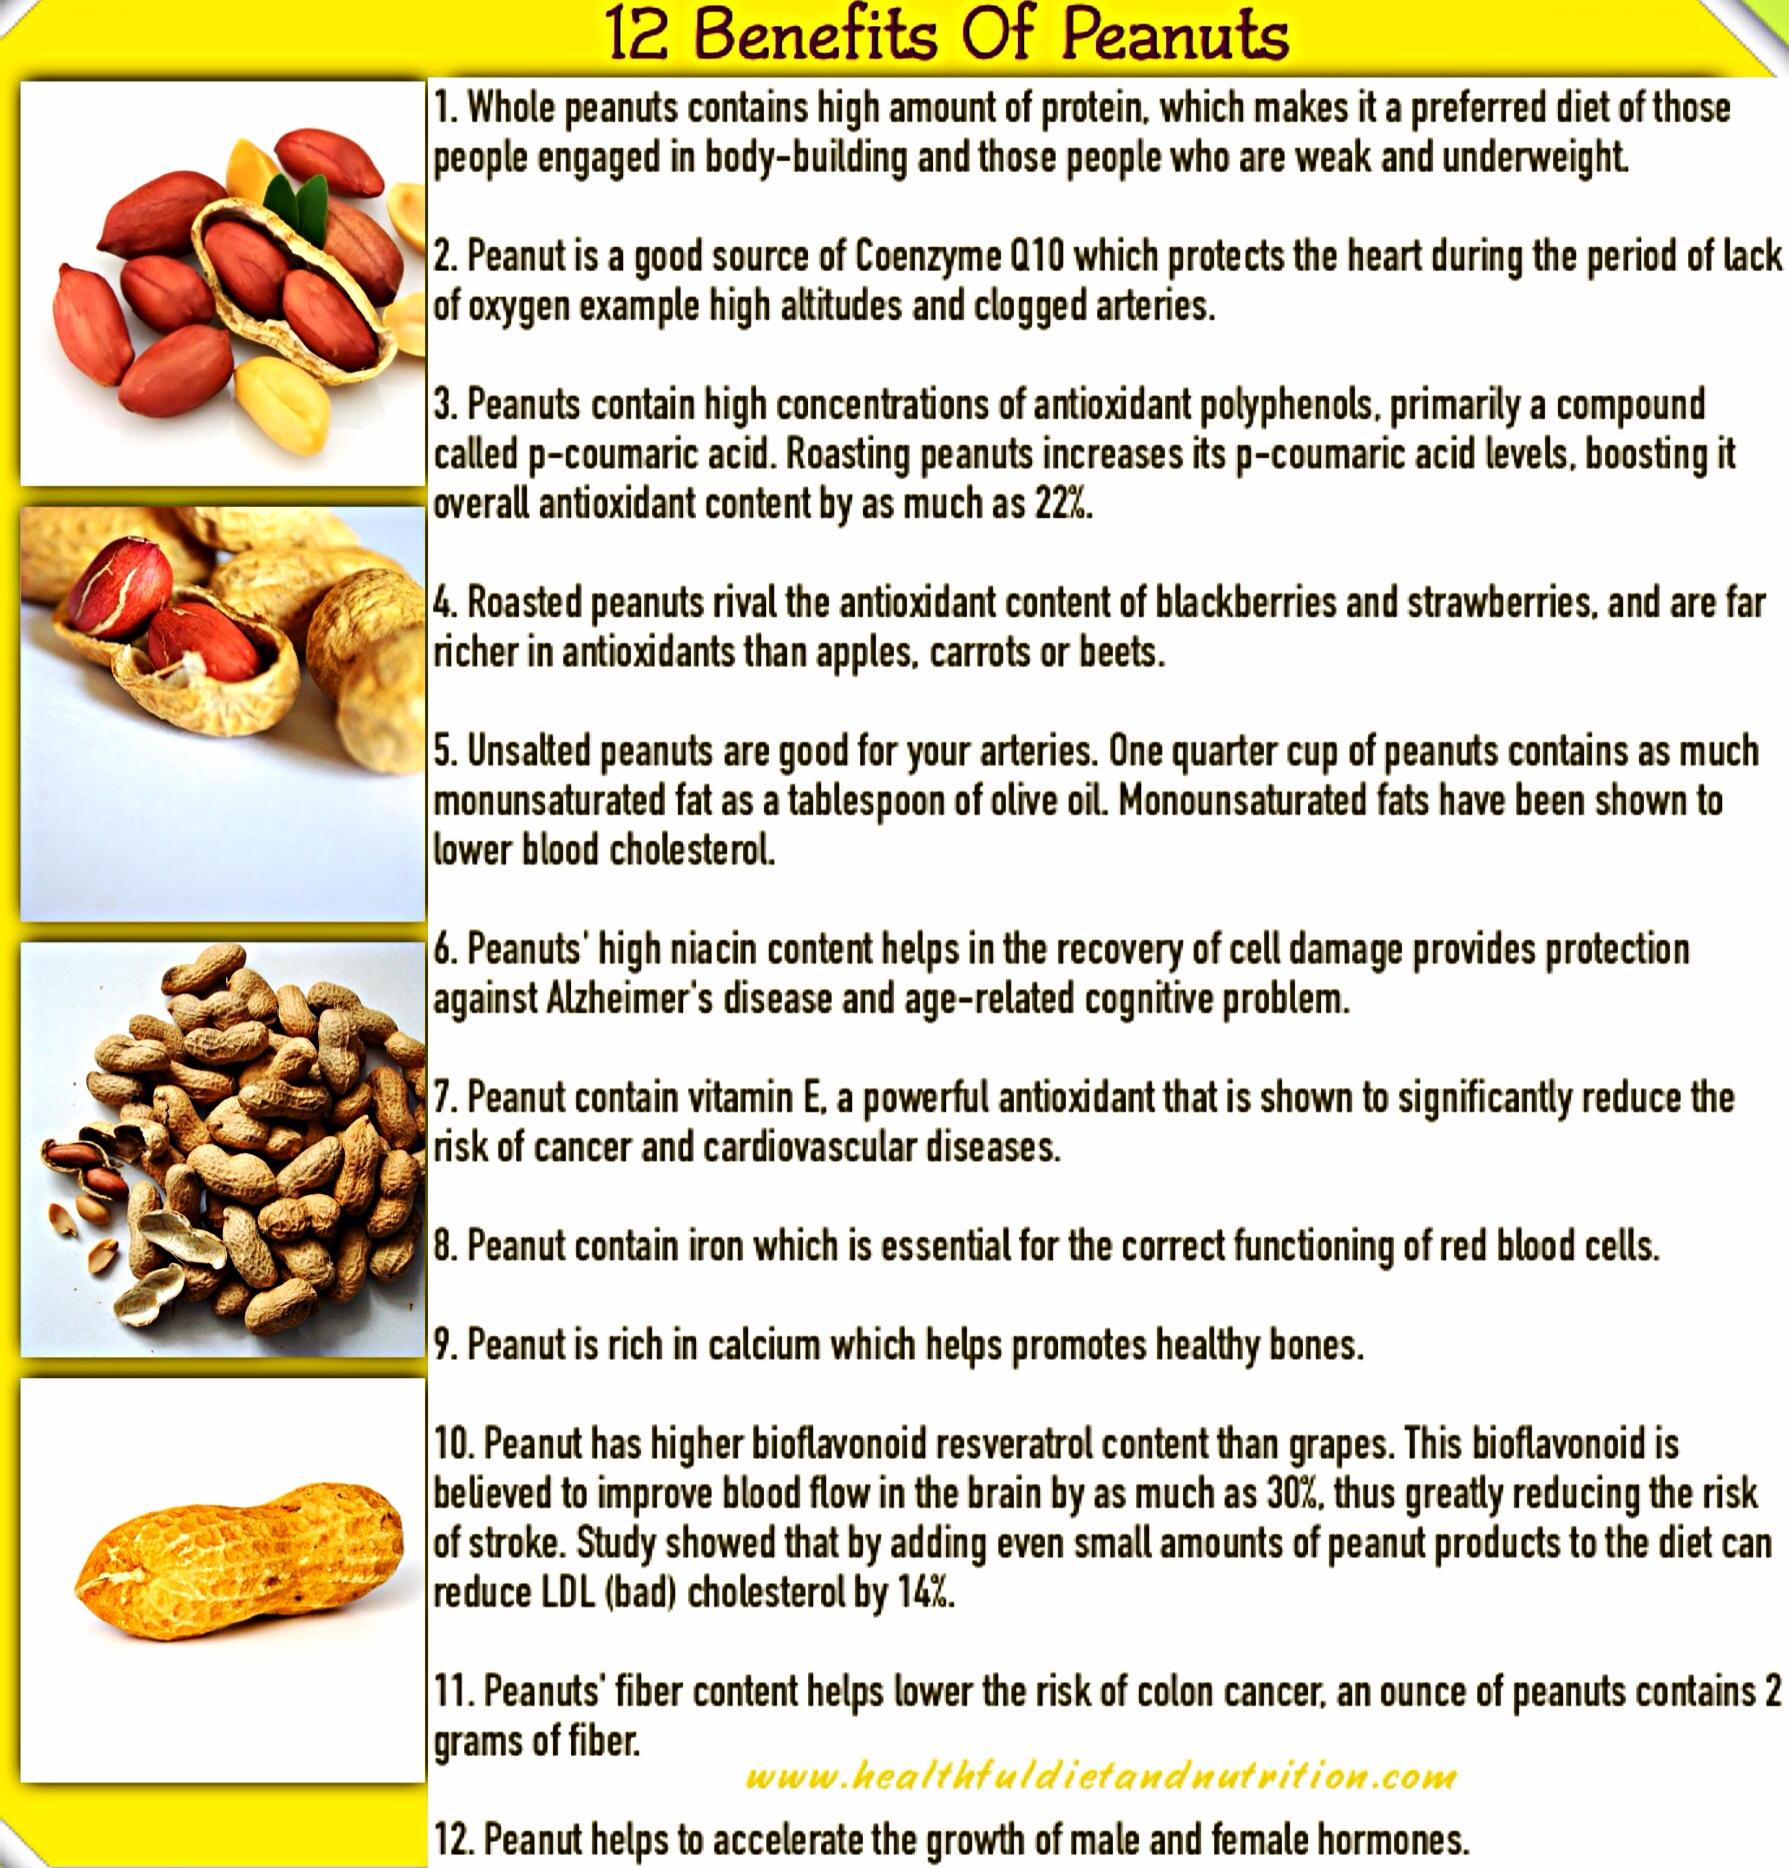 12 Benefits of Peanuts